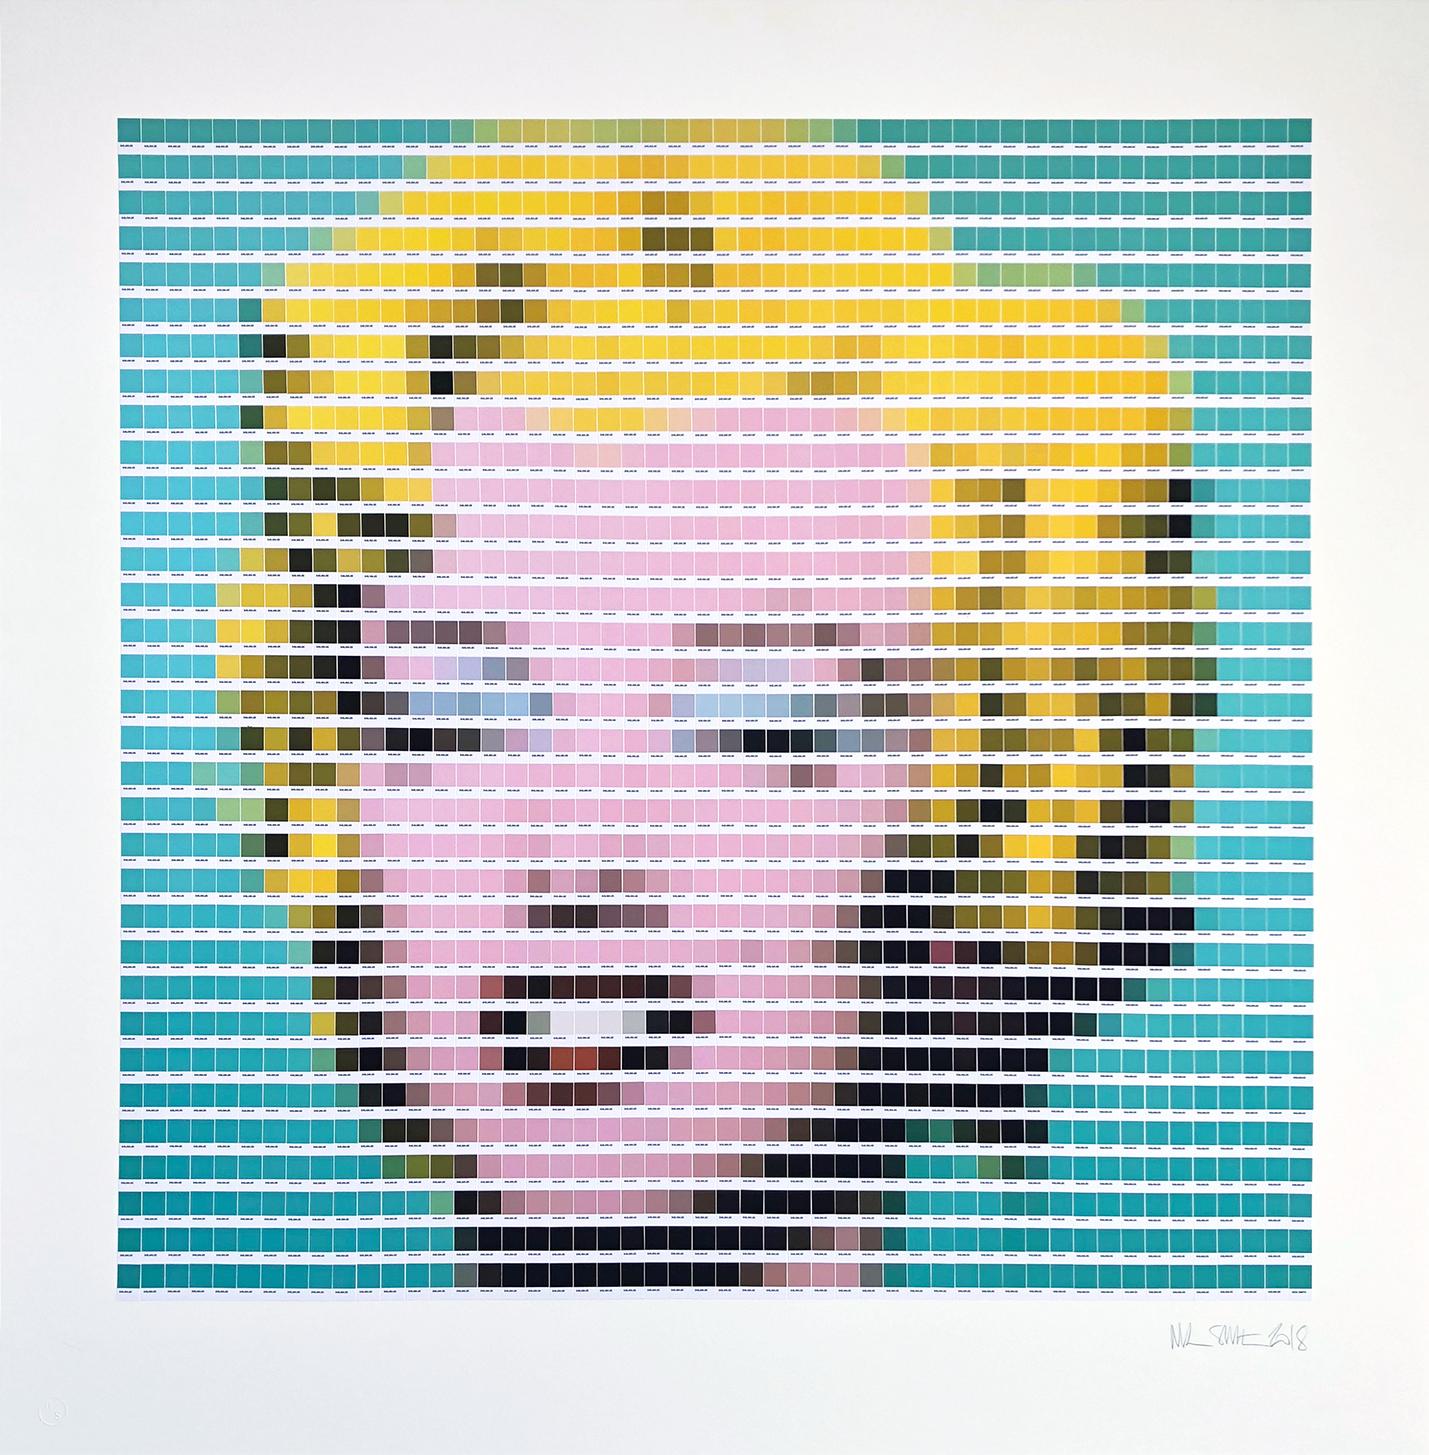 Warhol - Turquoise Marilyn